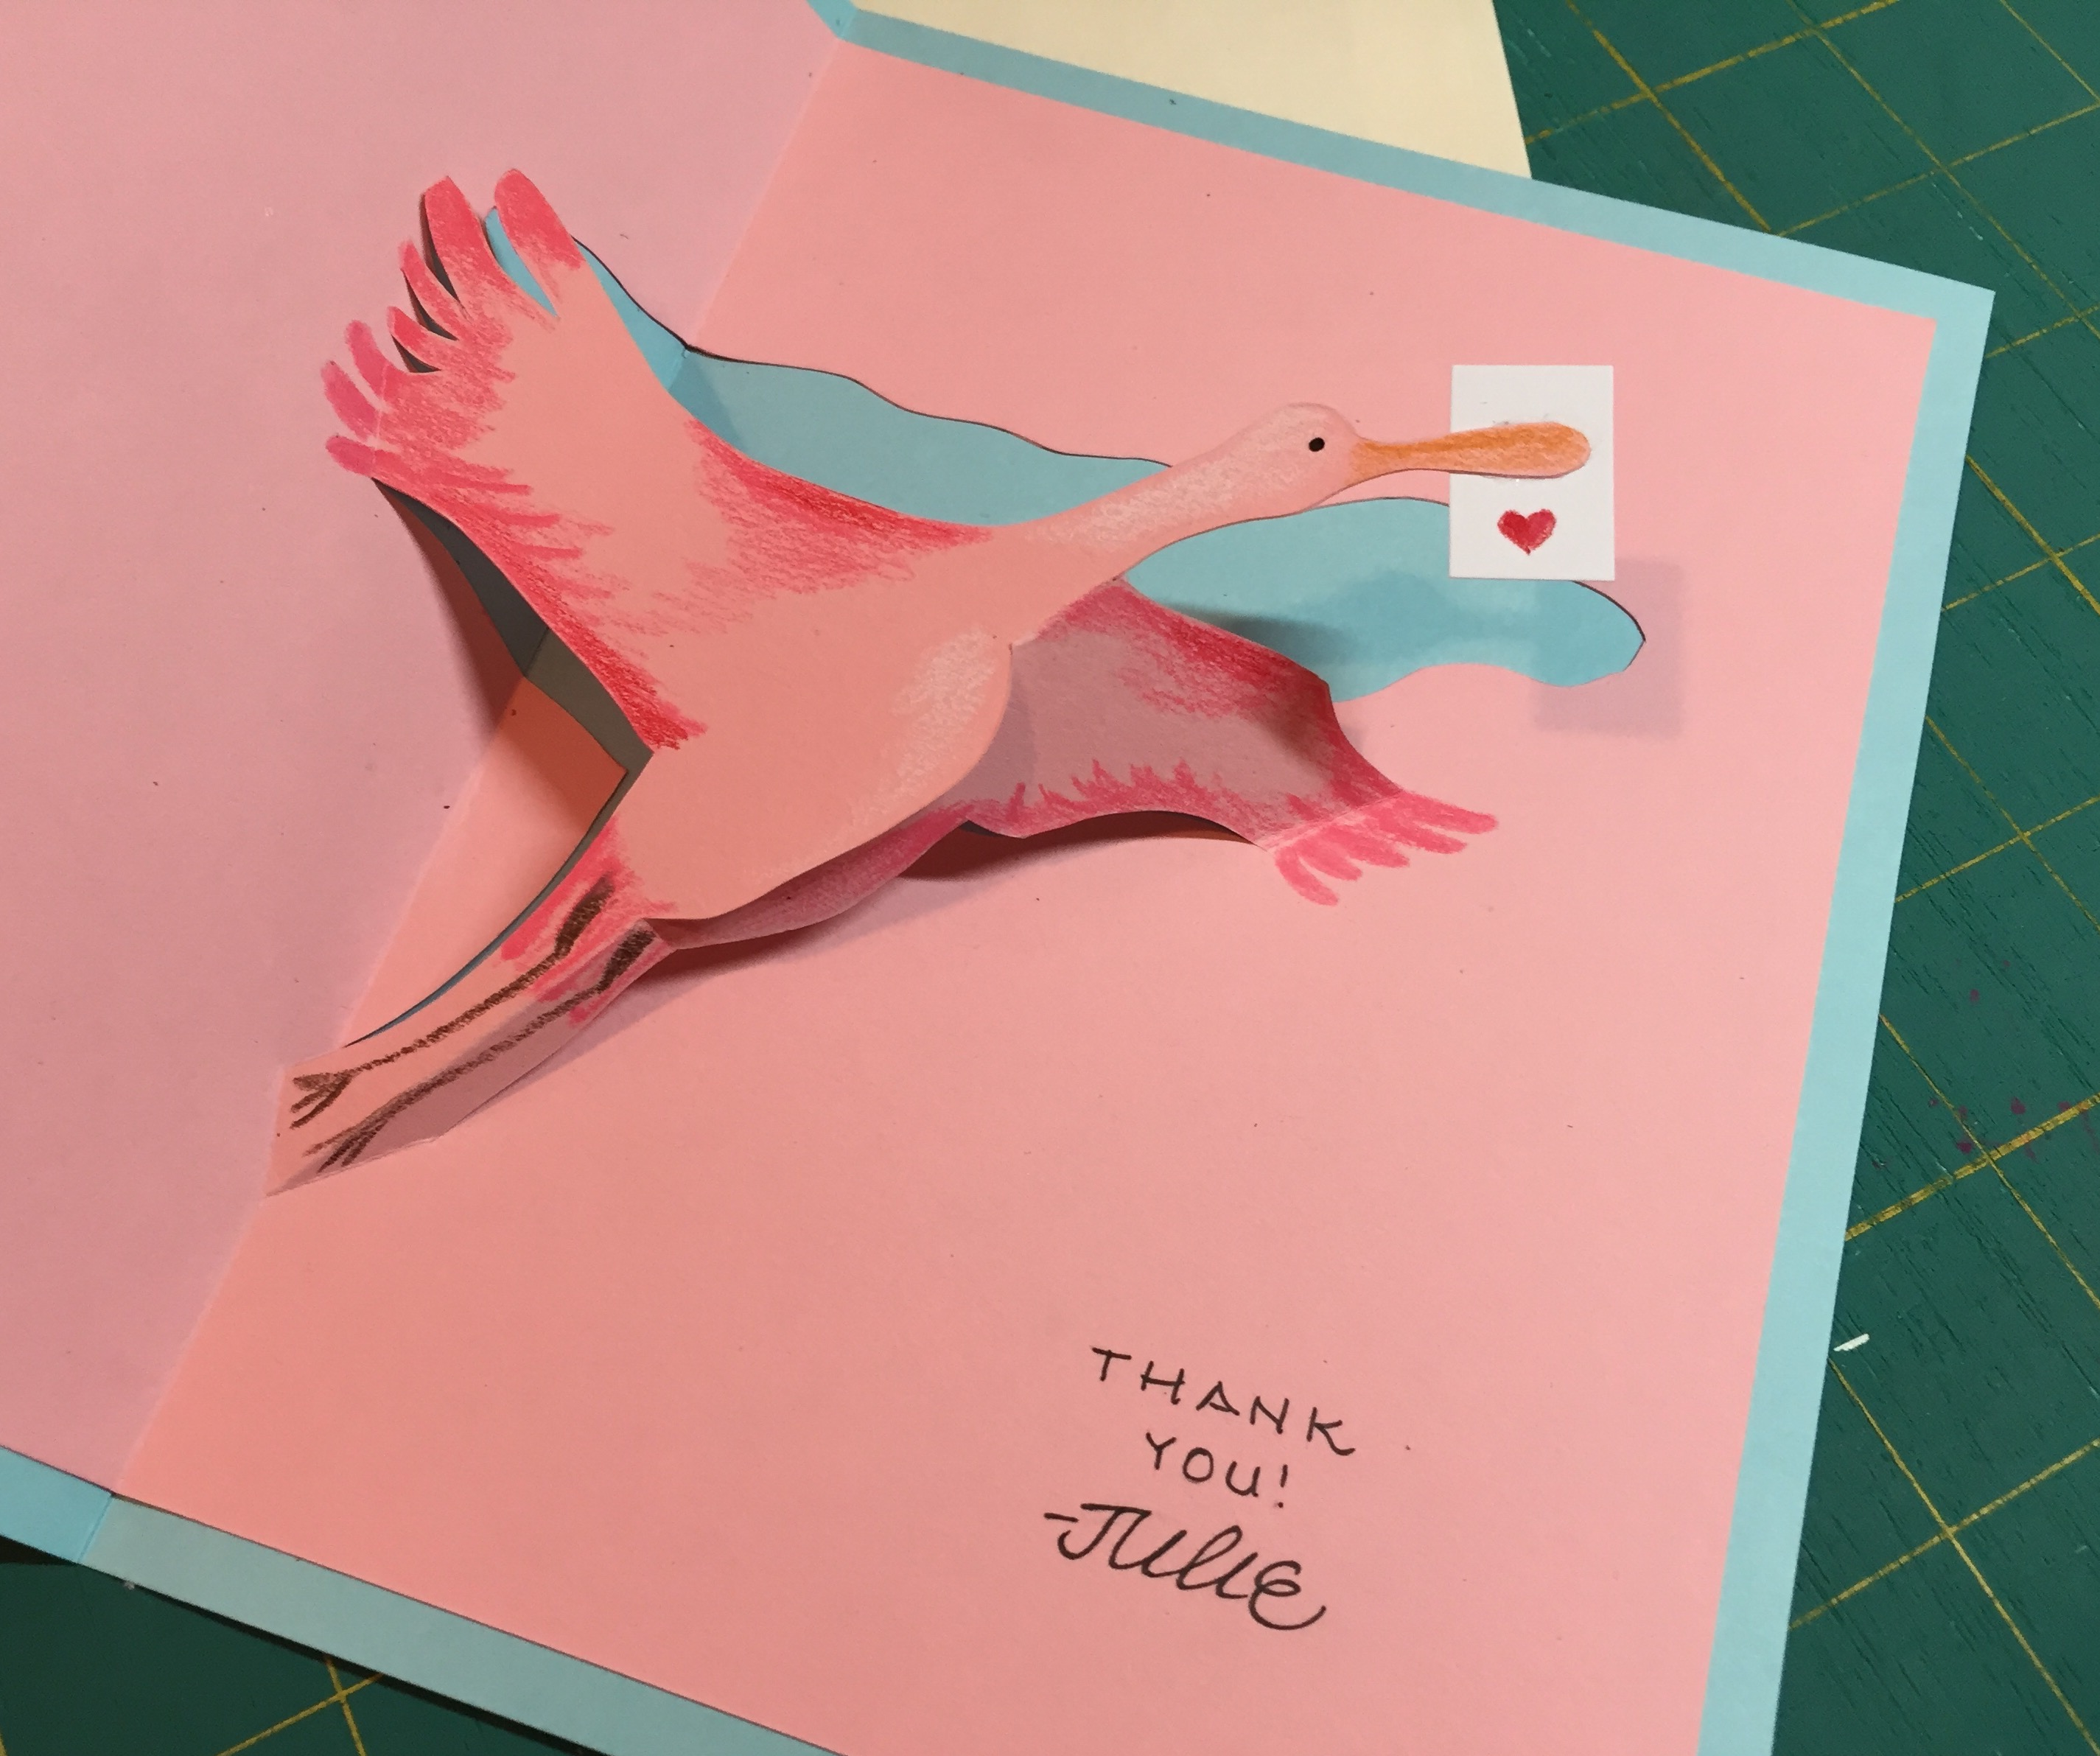 The crane sends thanks!